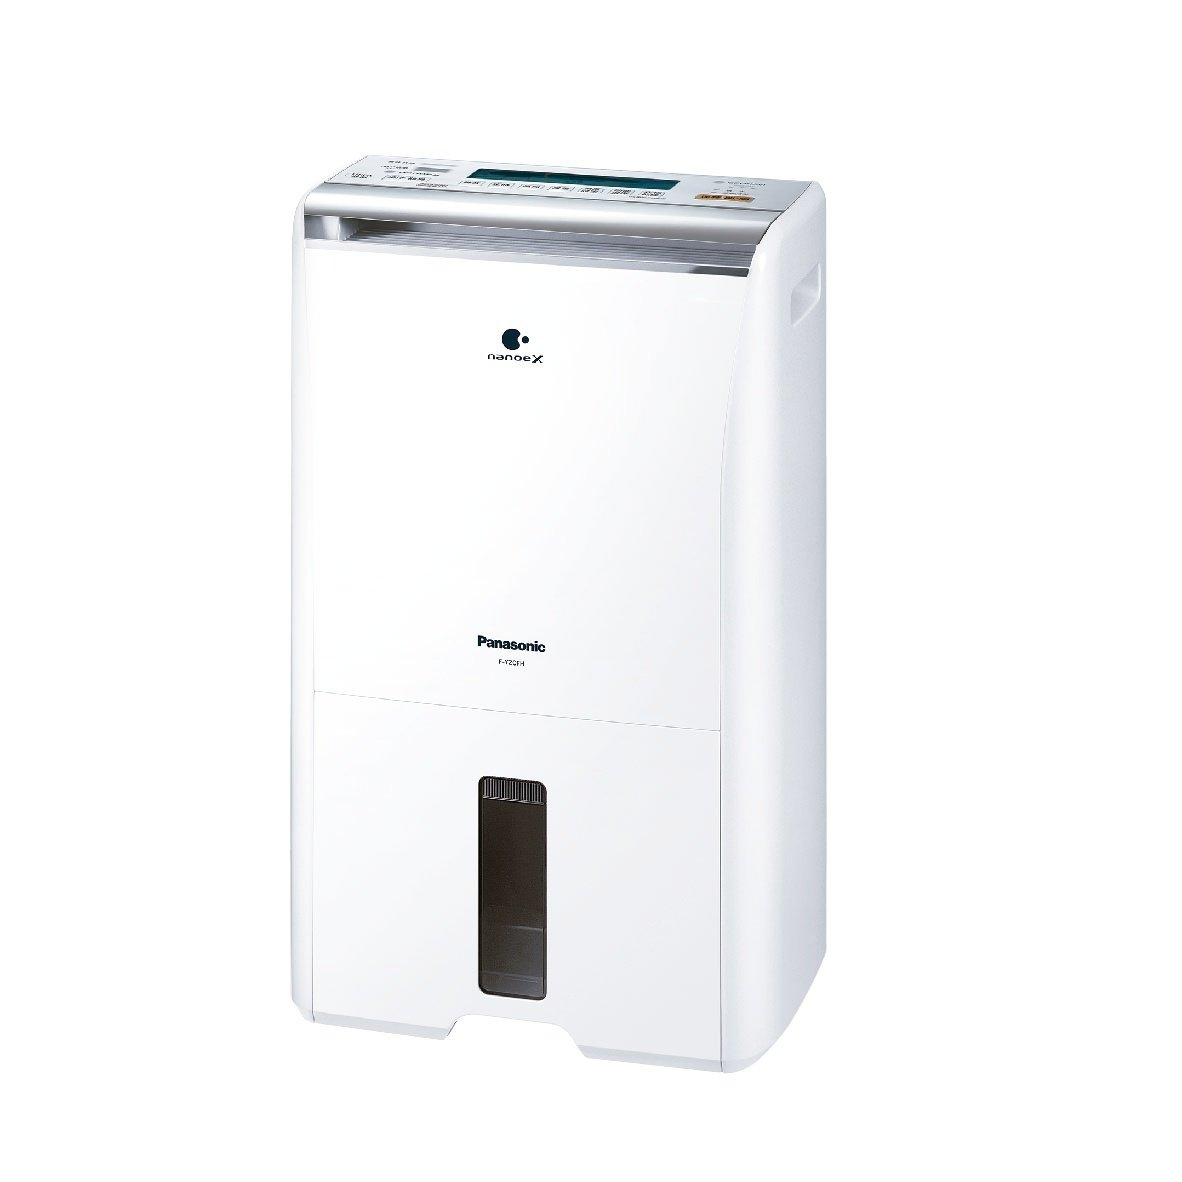 Panasonic 10L清淨除濕機,原價14,390元、燦坤3C活動價12,8...